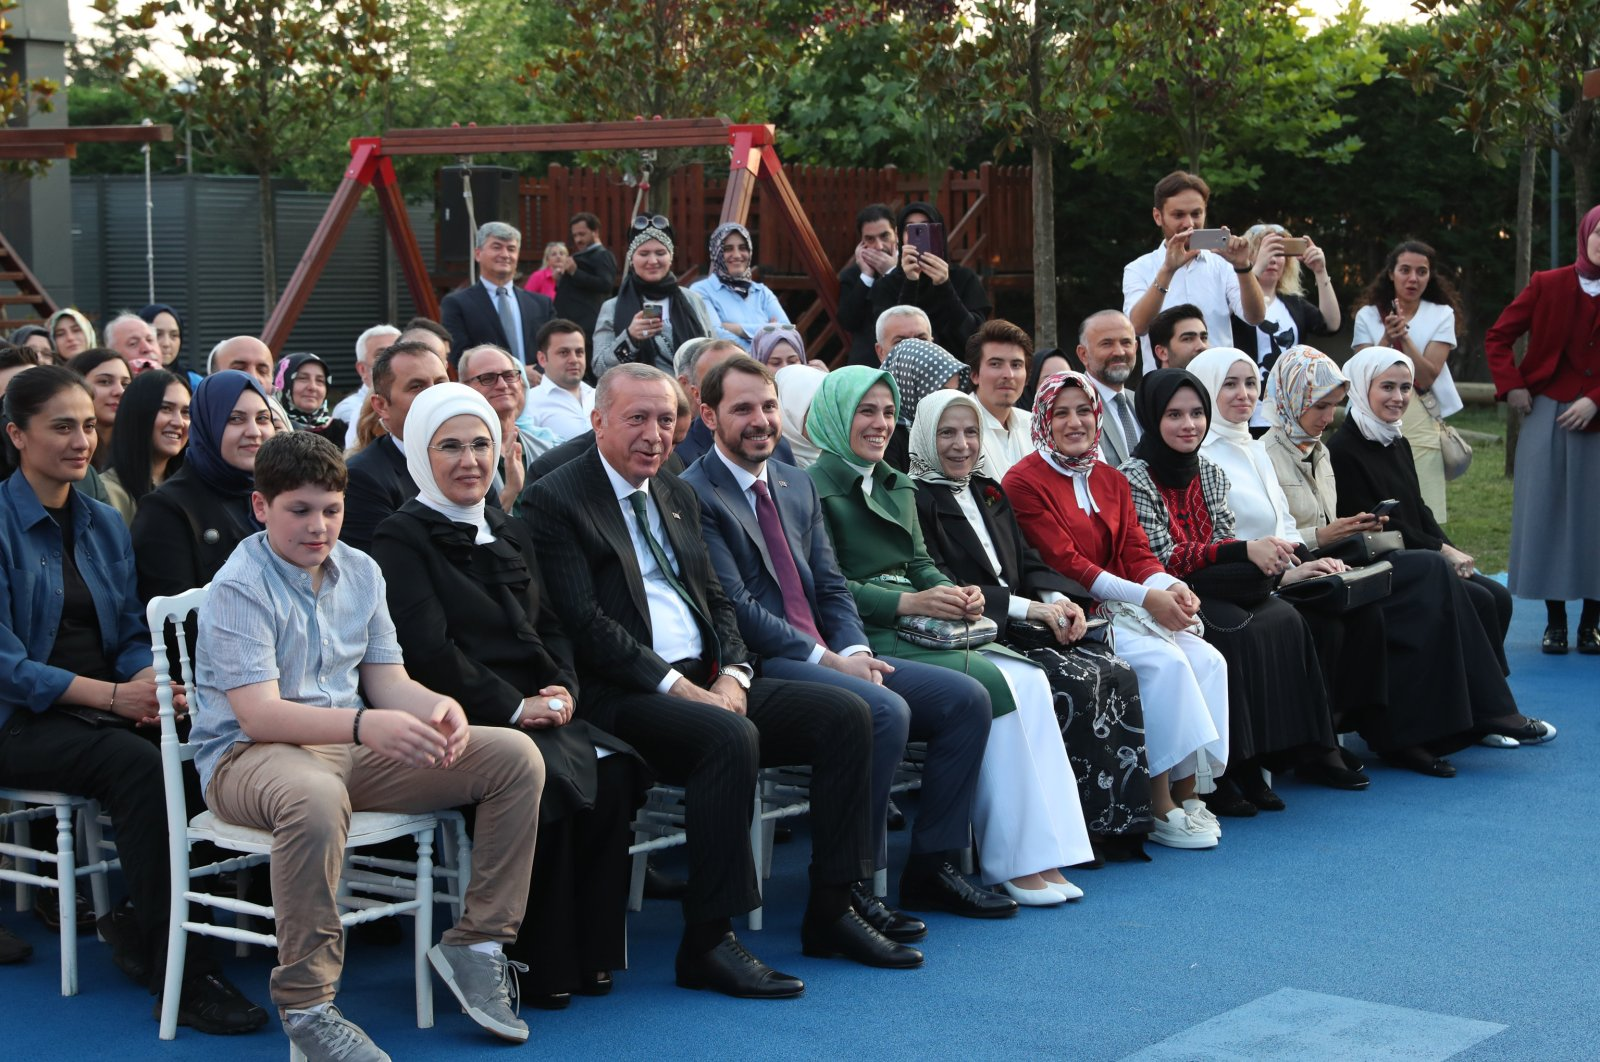 President Recep Tayyip Erdoğan sits next to his wife Emine Erdoğan, his daughter Esra Albayrak, his son-in-law Berat Albayrak and his grandson Ahmet Akif during an event in Istanbul, Turkey, June 22, 2019. (AA Photo)